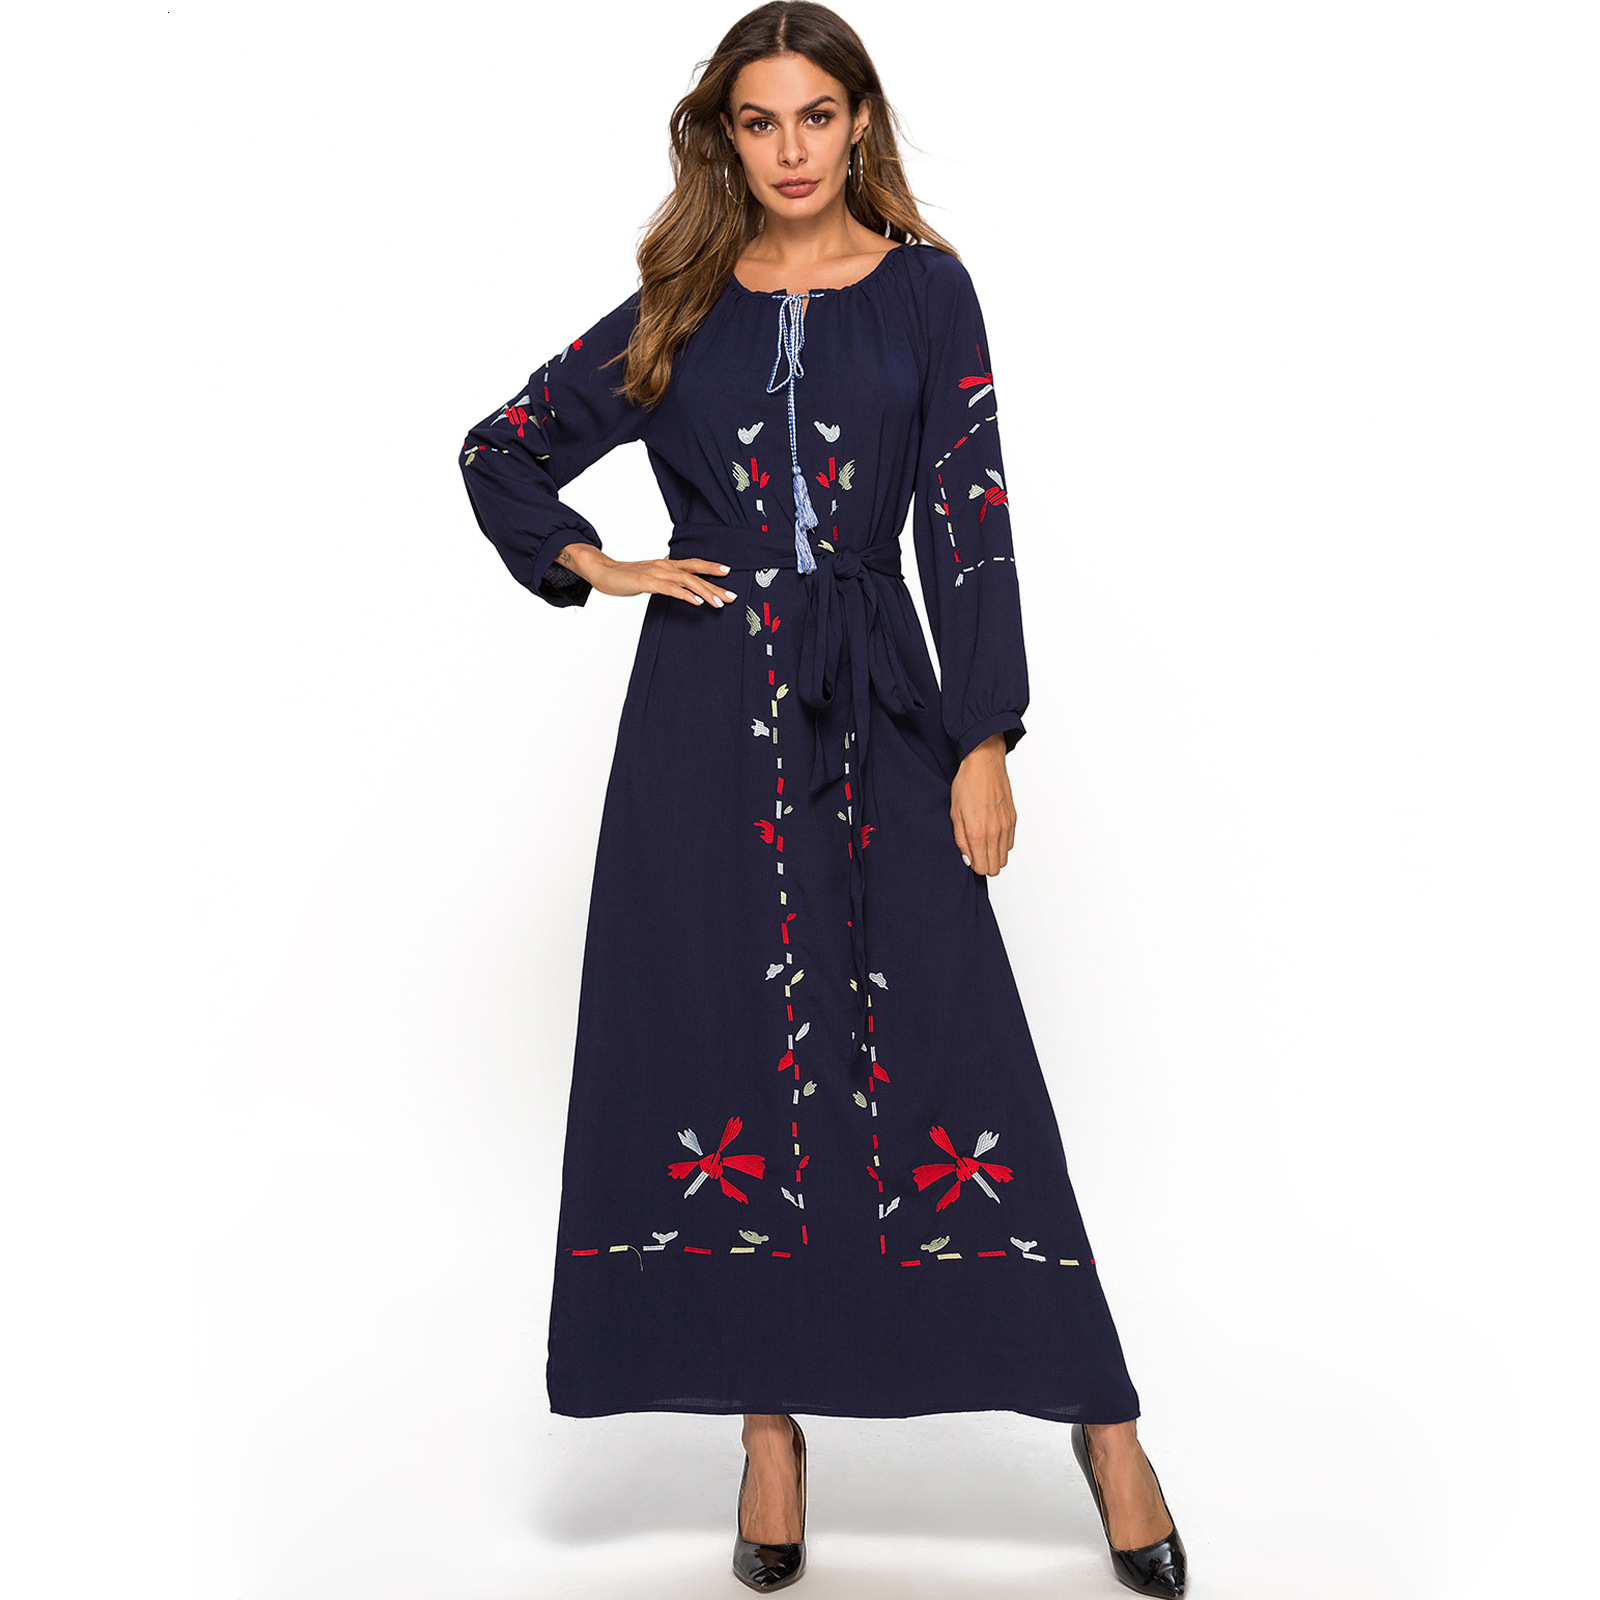 Will Code costume-Robe costume-Robe musulmane arabe Robe broderie Code automne Robe noire femmes dames robes